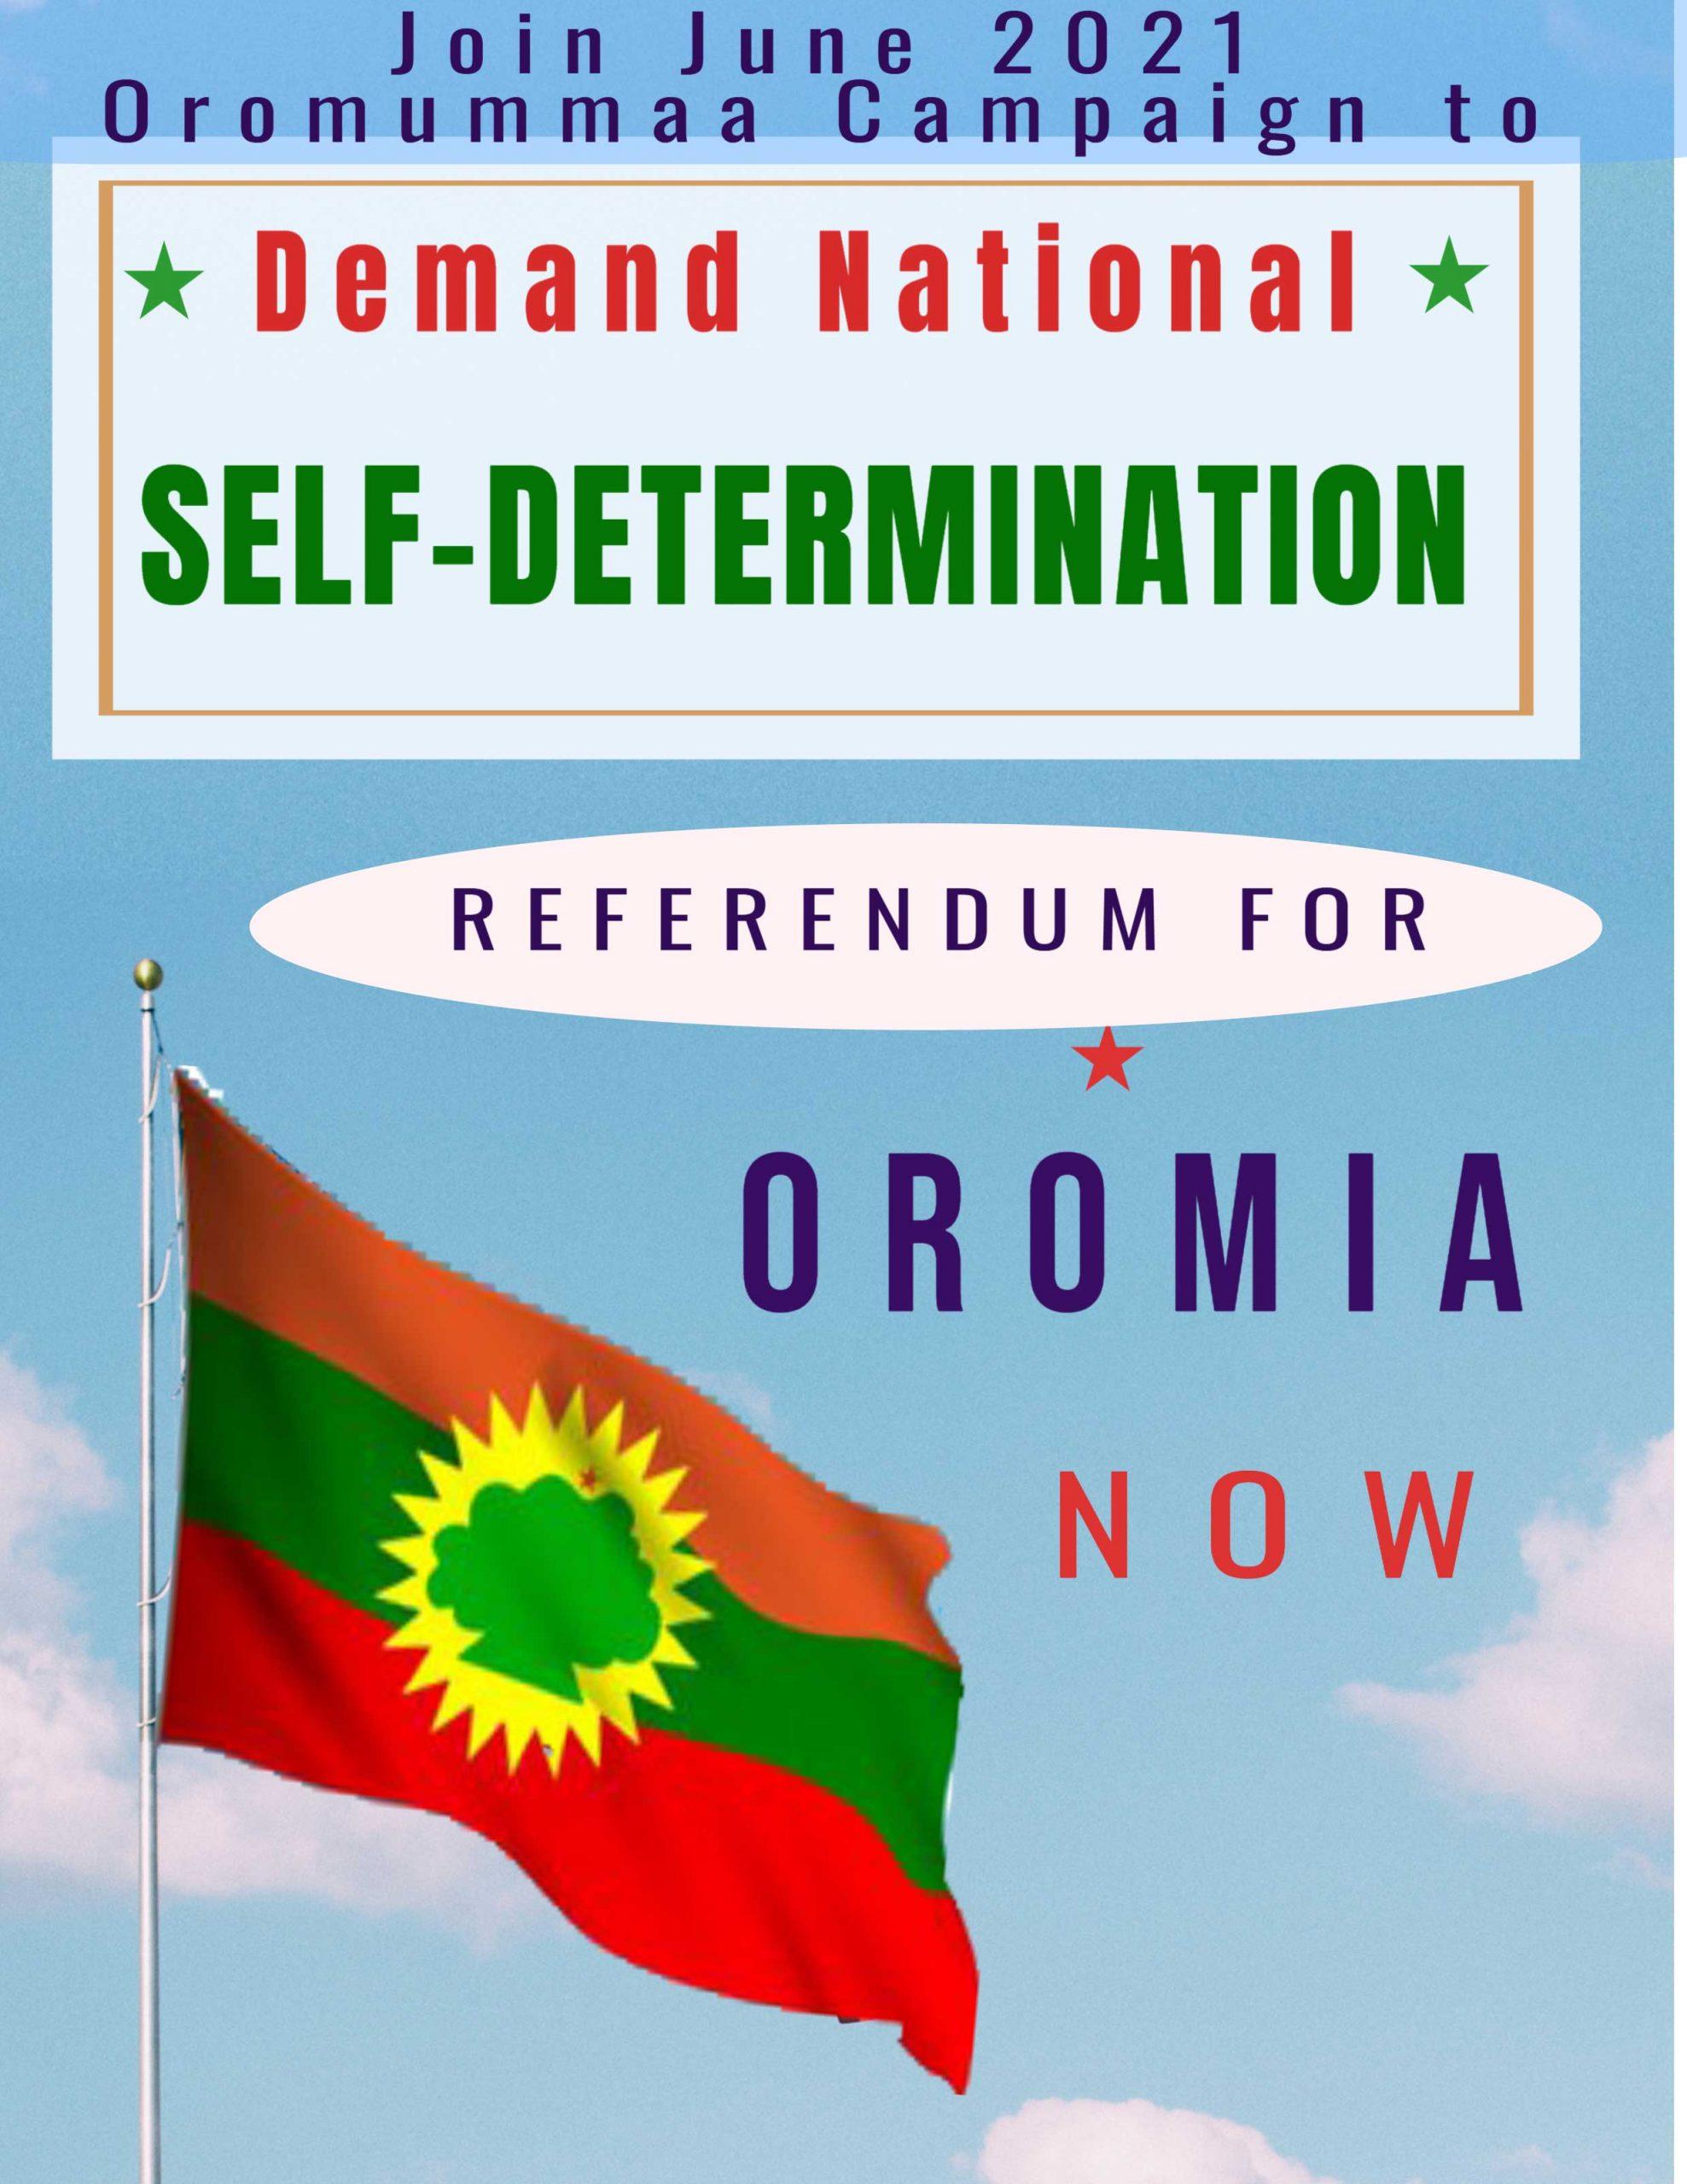 Referendum for Oromia